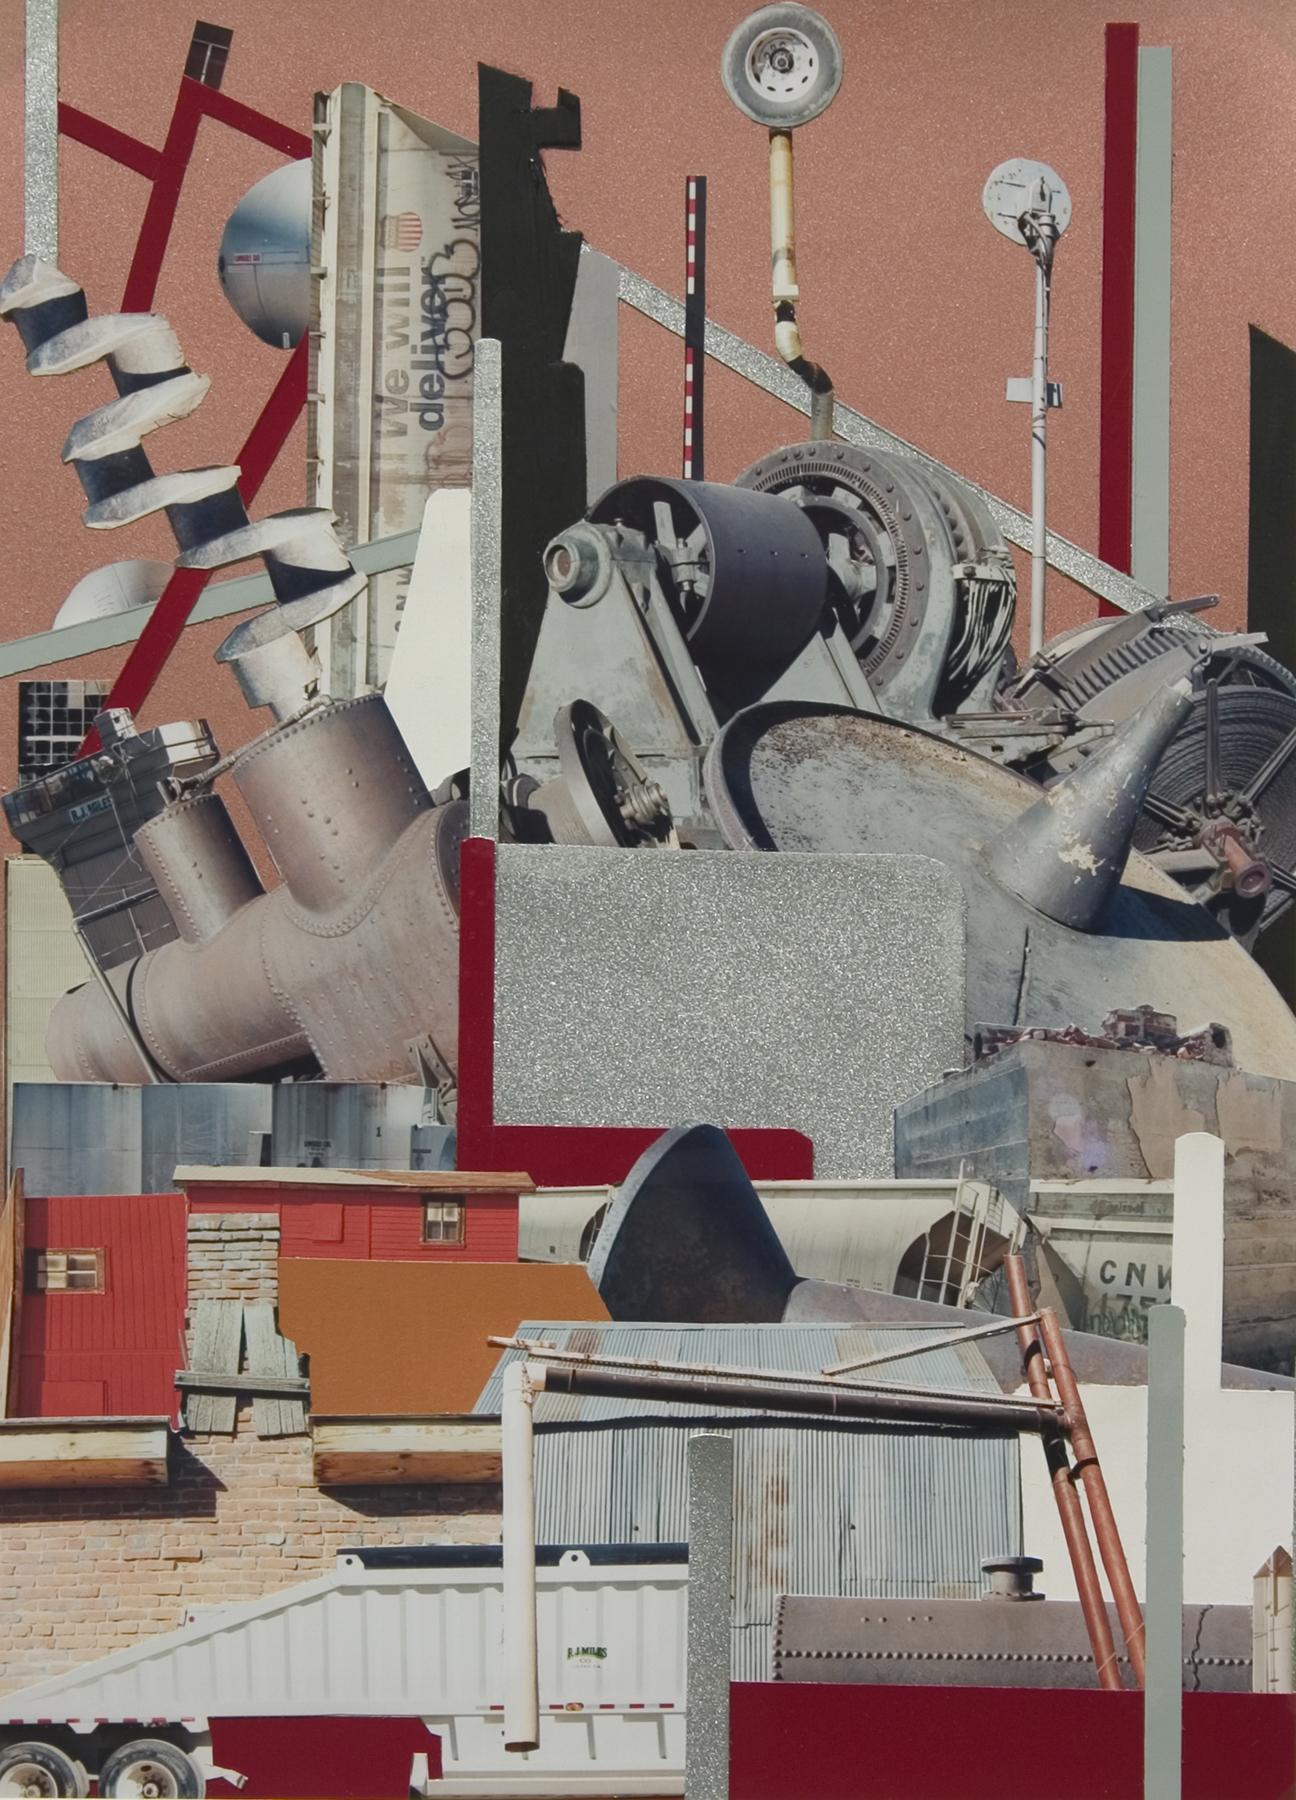 "Sheeler's Wake . Mixed Media Collage, 13.5 x 9.5"", 2006."